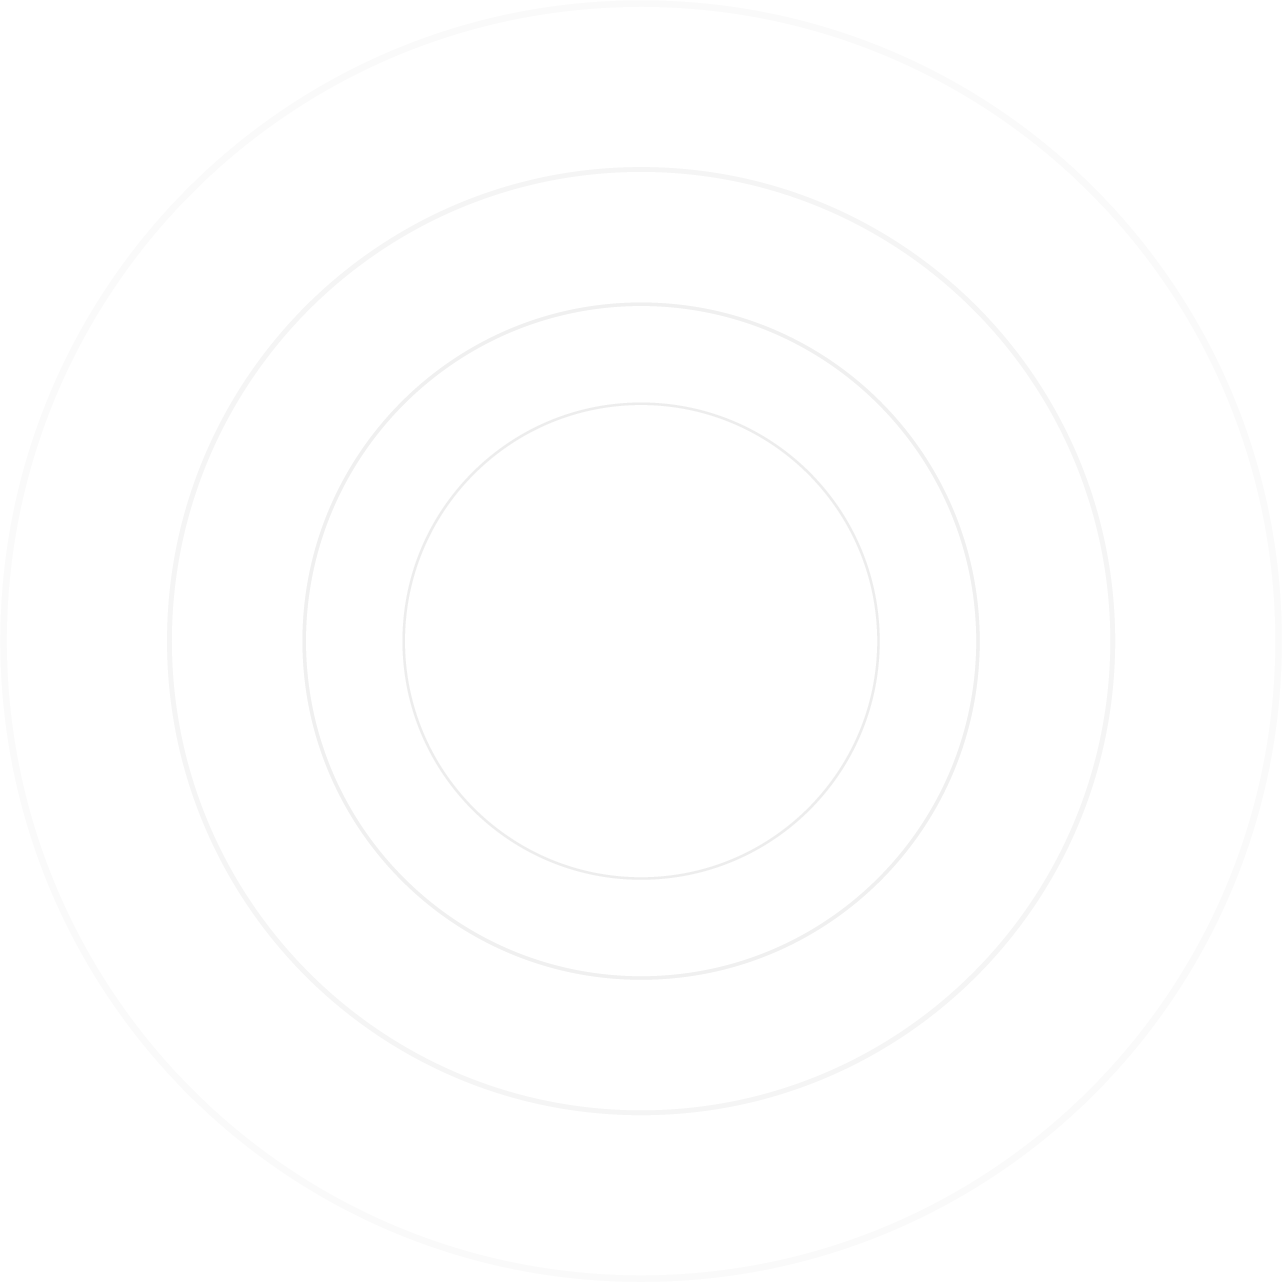 three-ciecle-icons